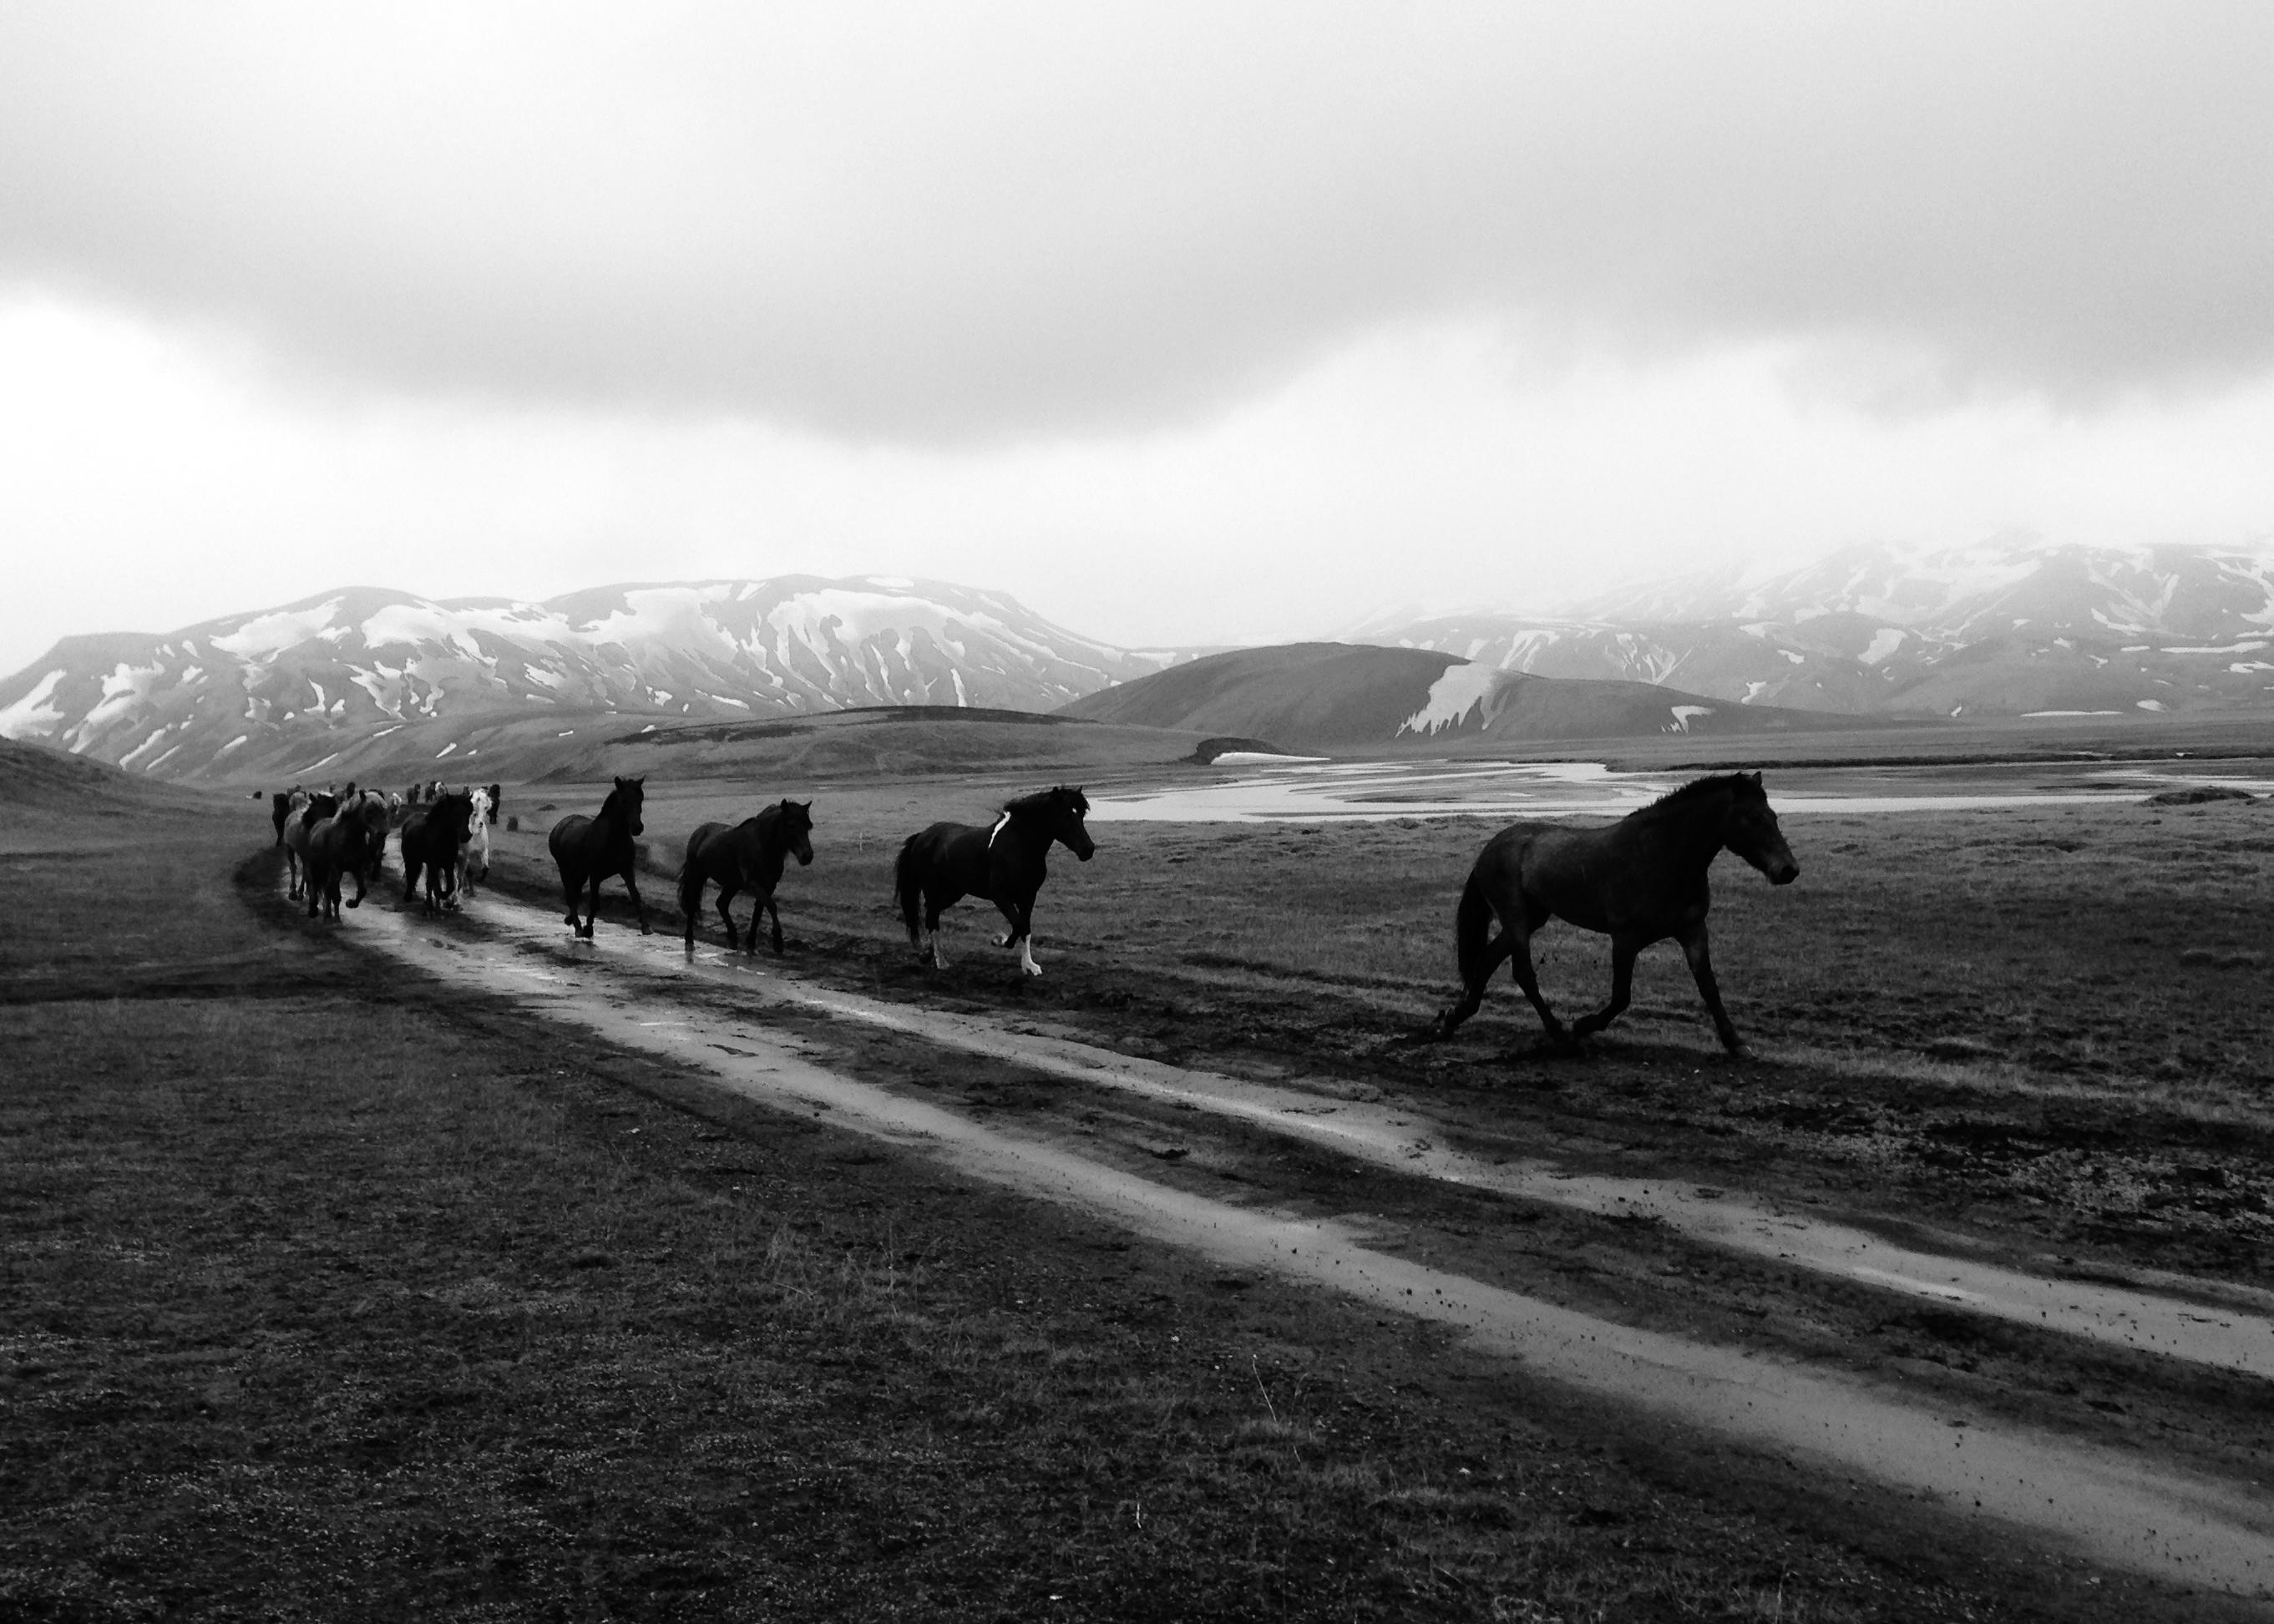 Caballos dejando Landmanalaugar